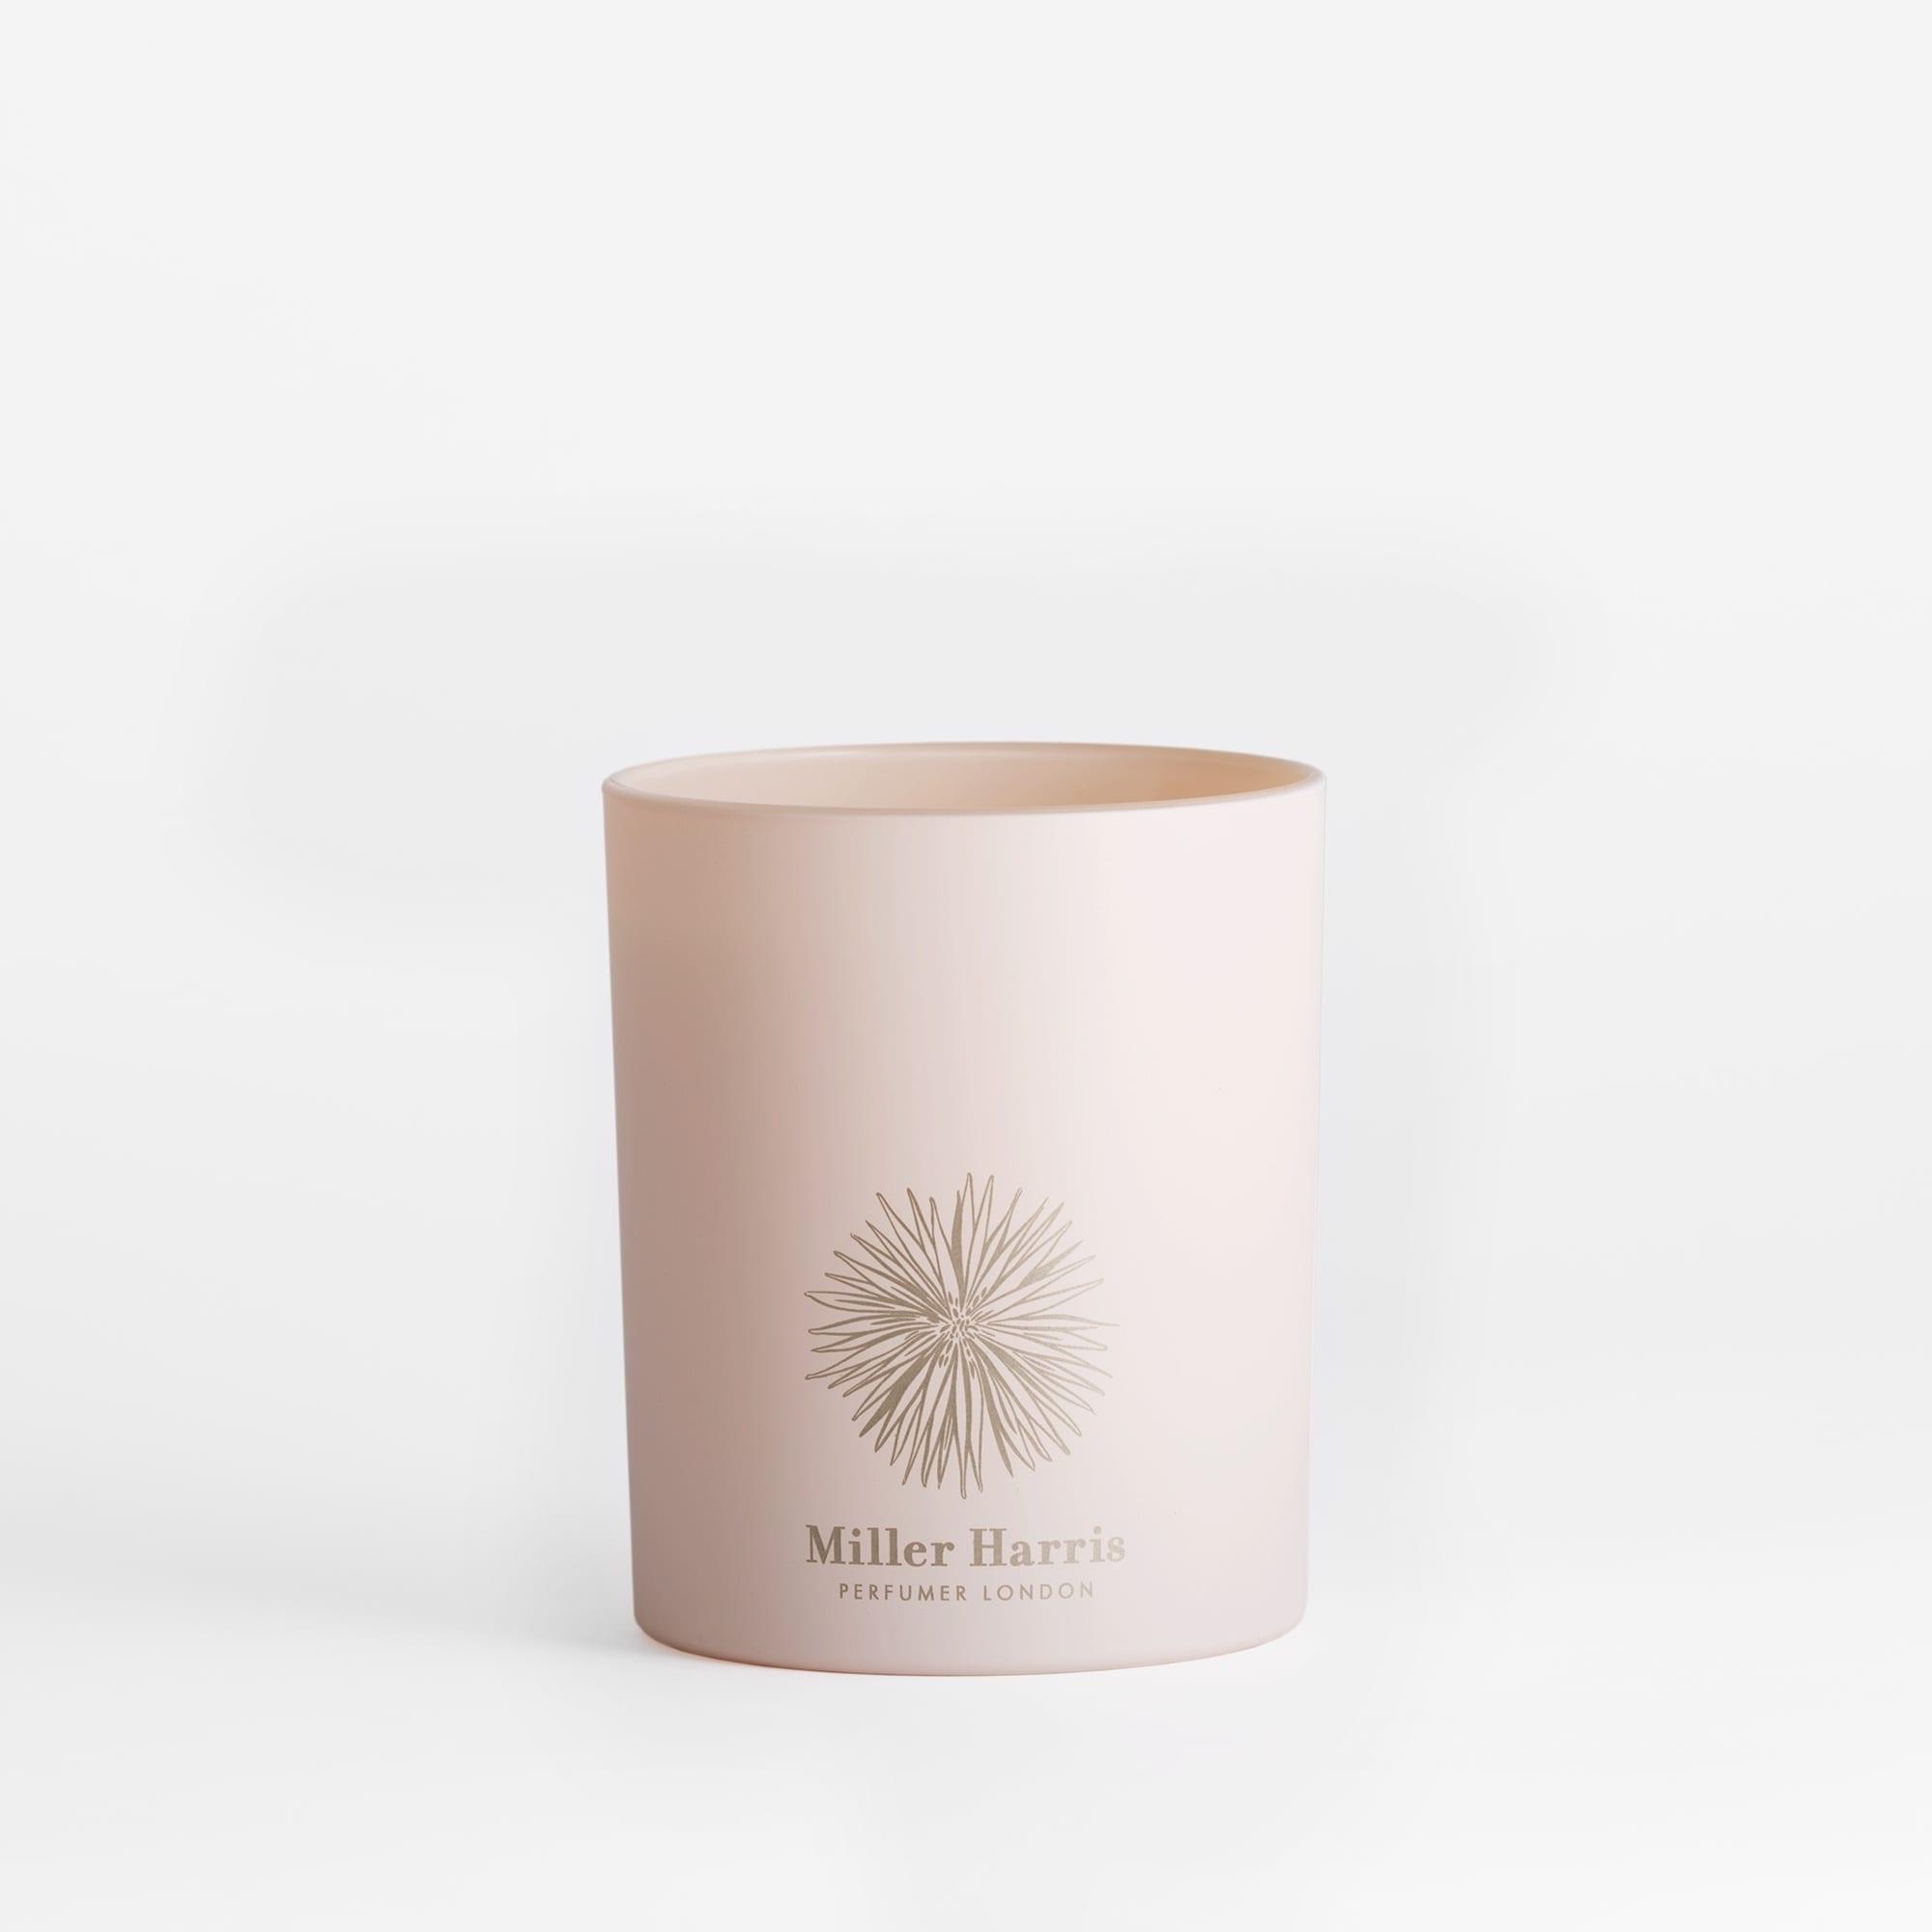 Miller Harris Candle Digne de Toi scent